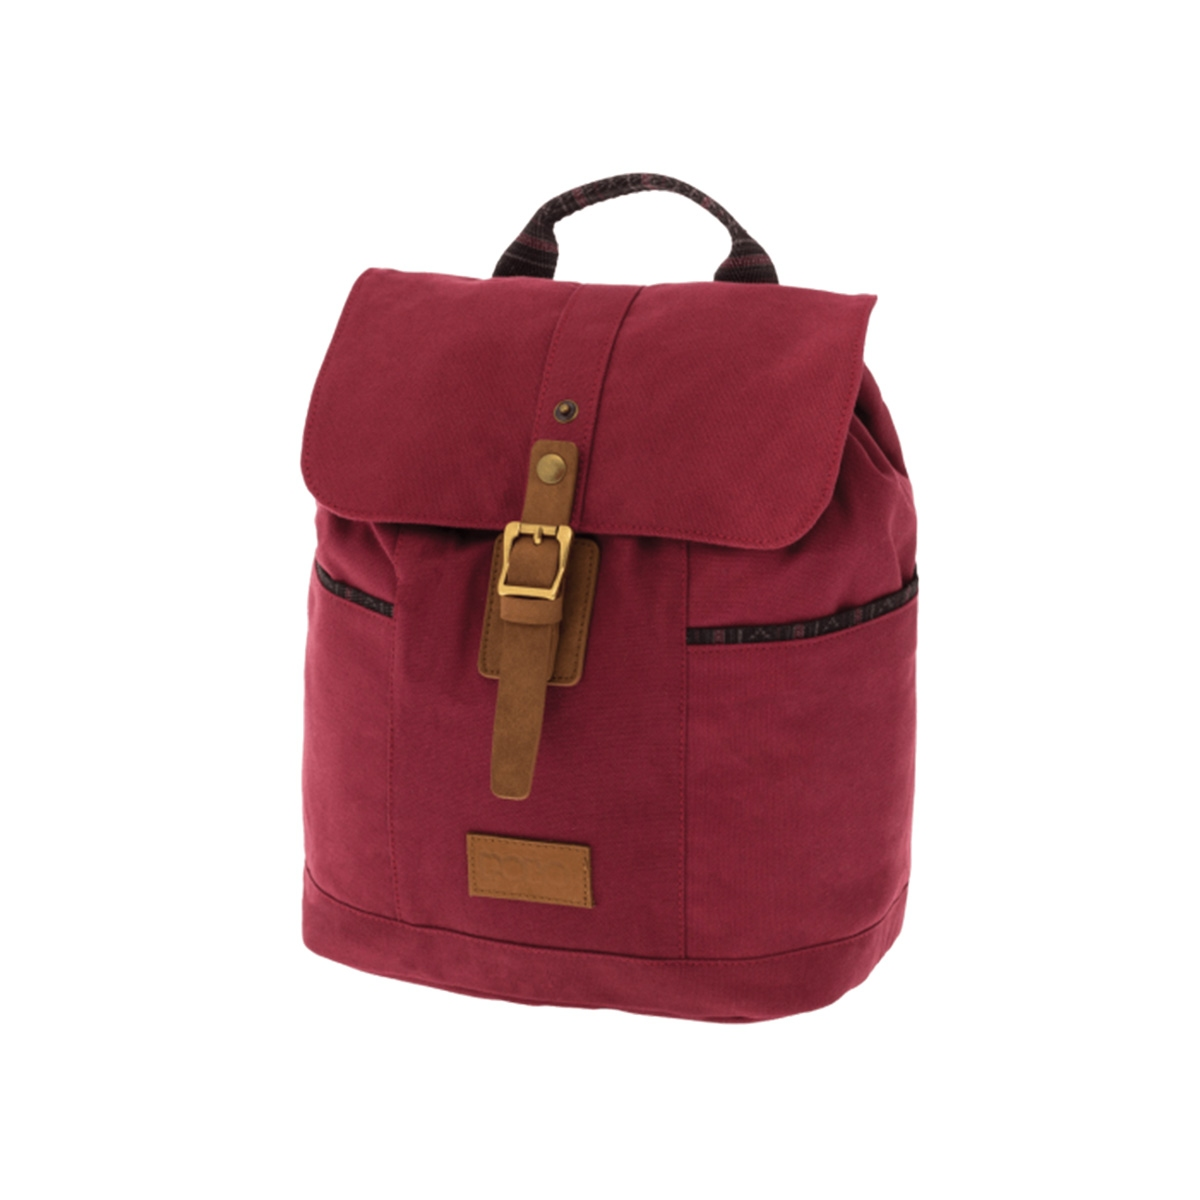 9db3e6b605 Σακίδιο Πλάτης Polo Backpack Canvas Lady 9-07-152-46 Μπορντό ...